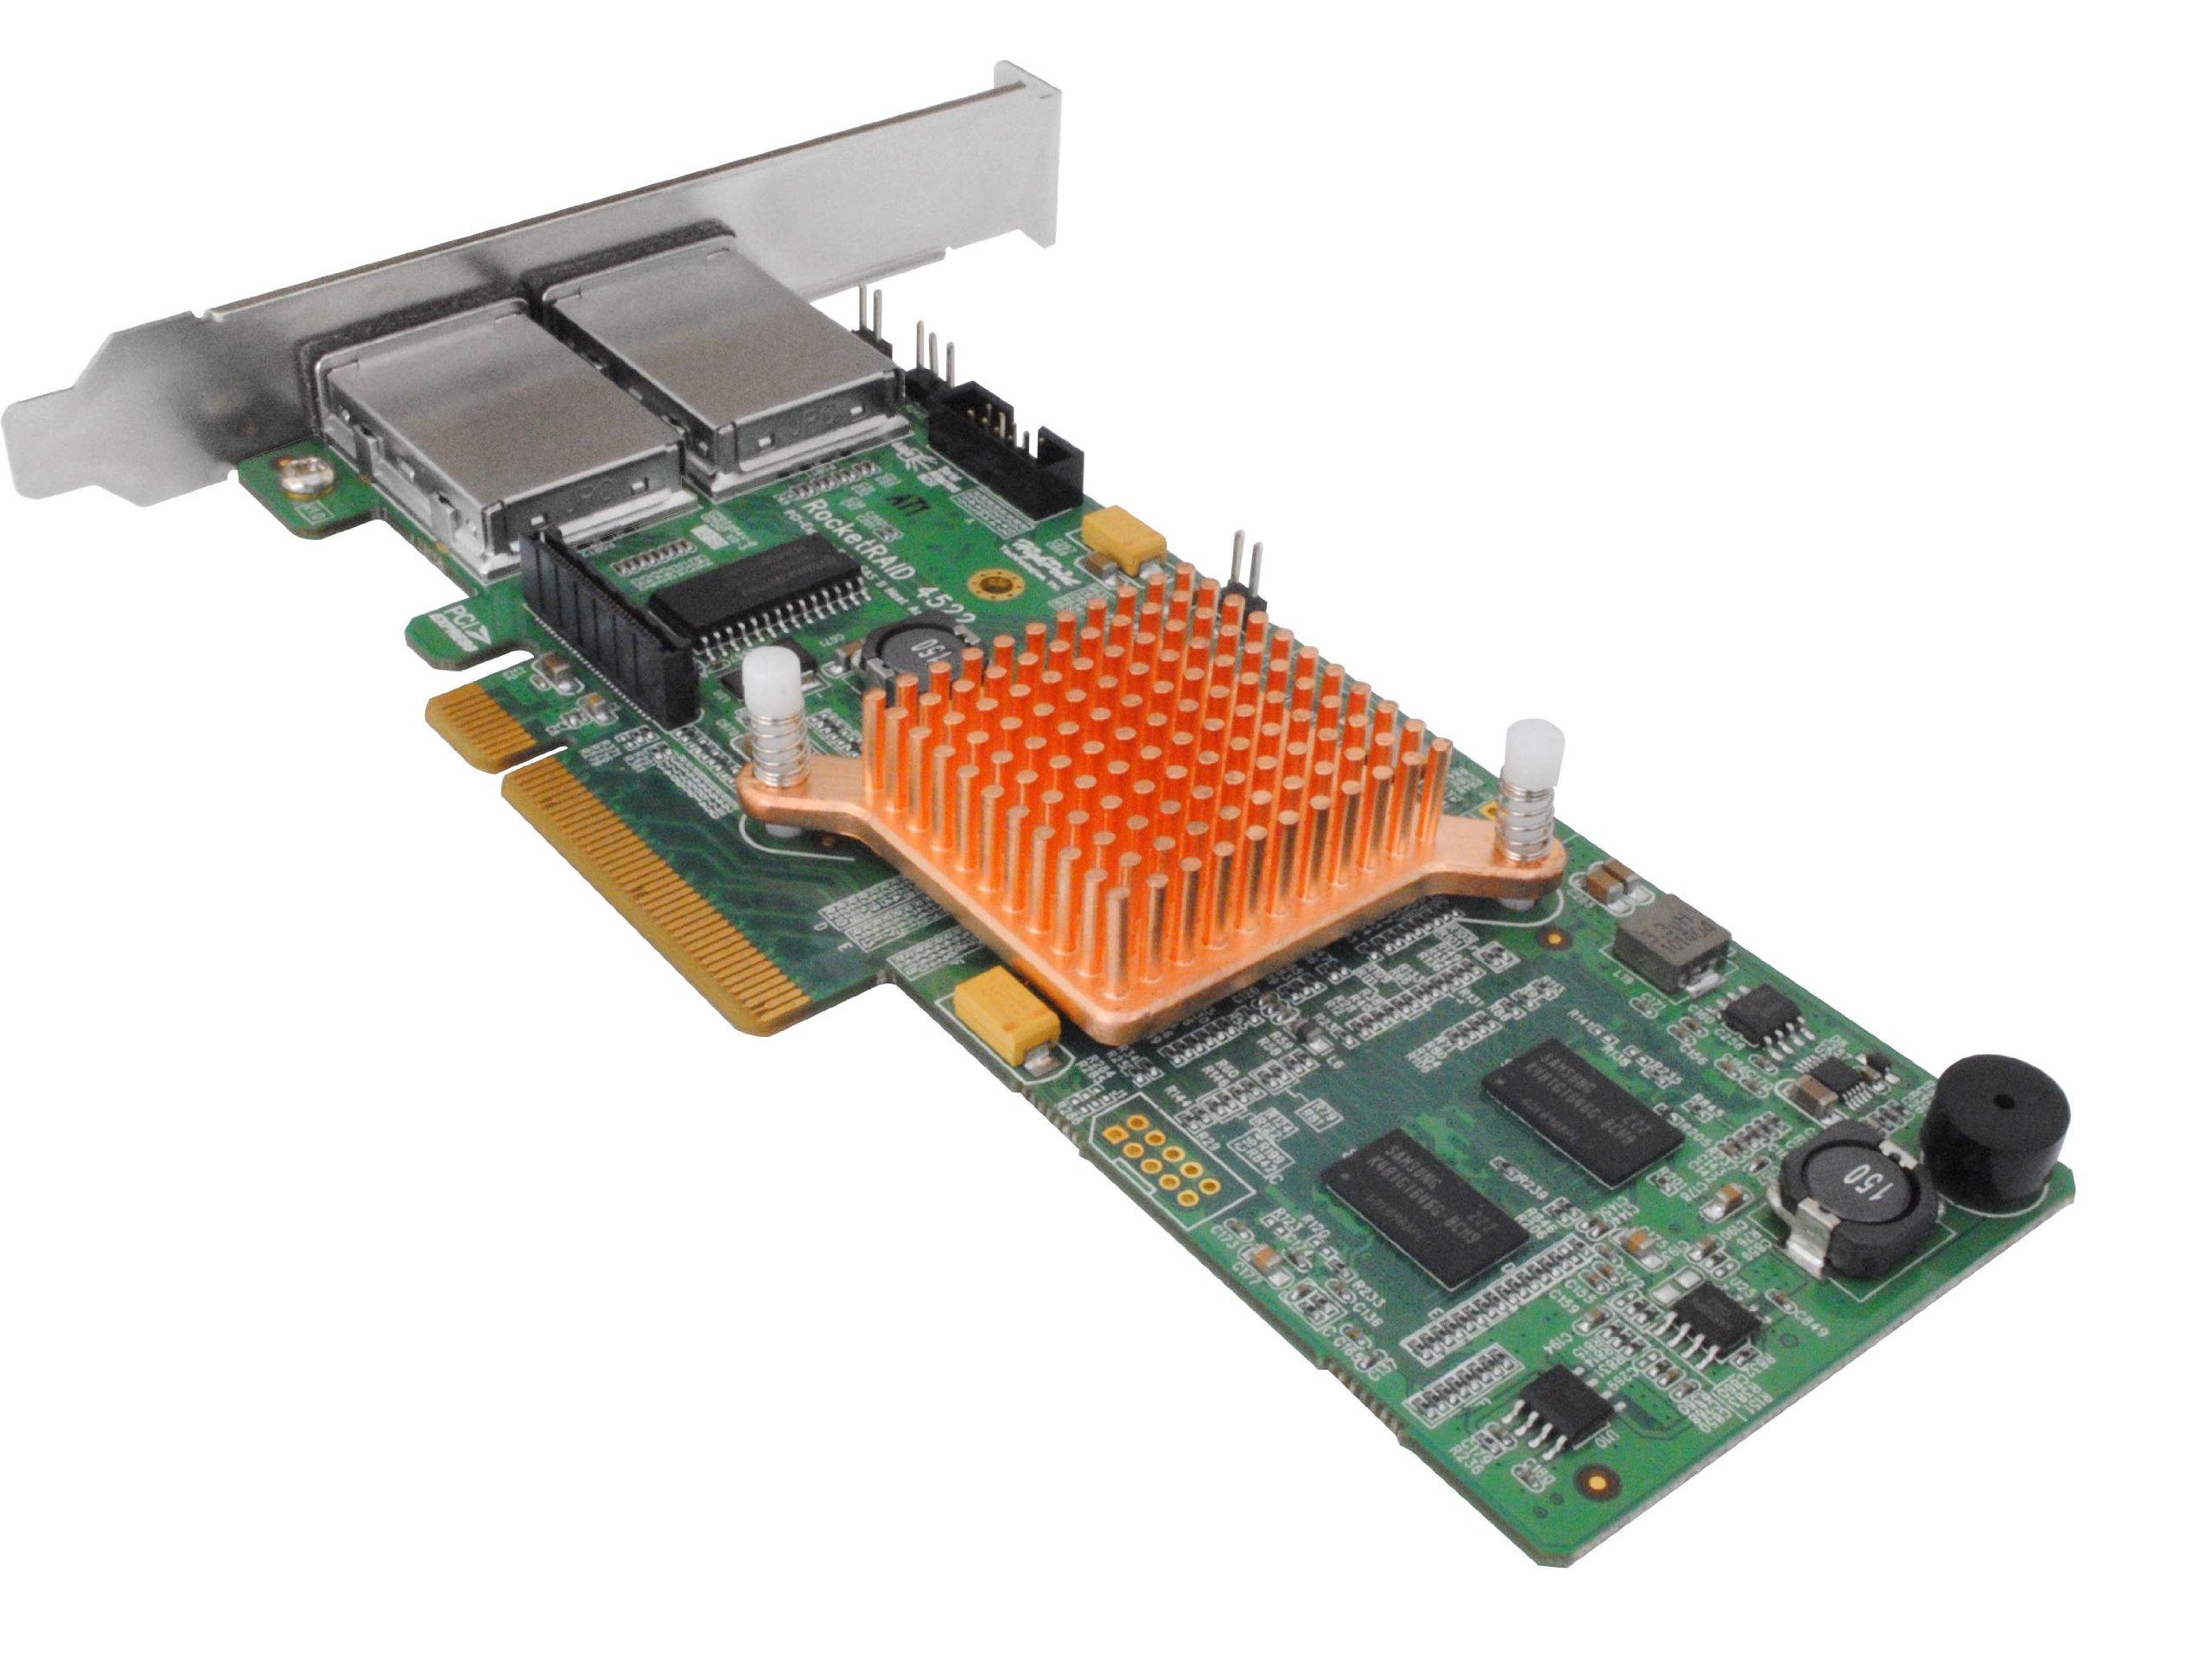 HighPoint RocketRAID 4522 8-Port External SAS 6Gb/s PCIe 2.0 x8 Hardware RAID HBA (SAS Tape / RAID Support)